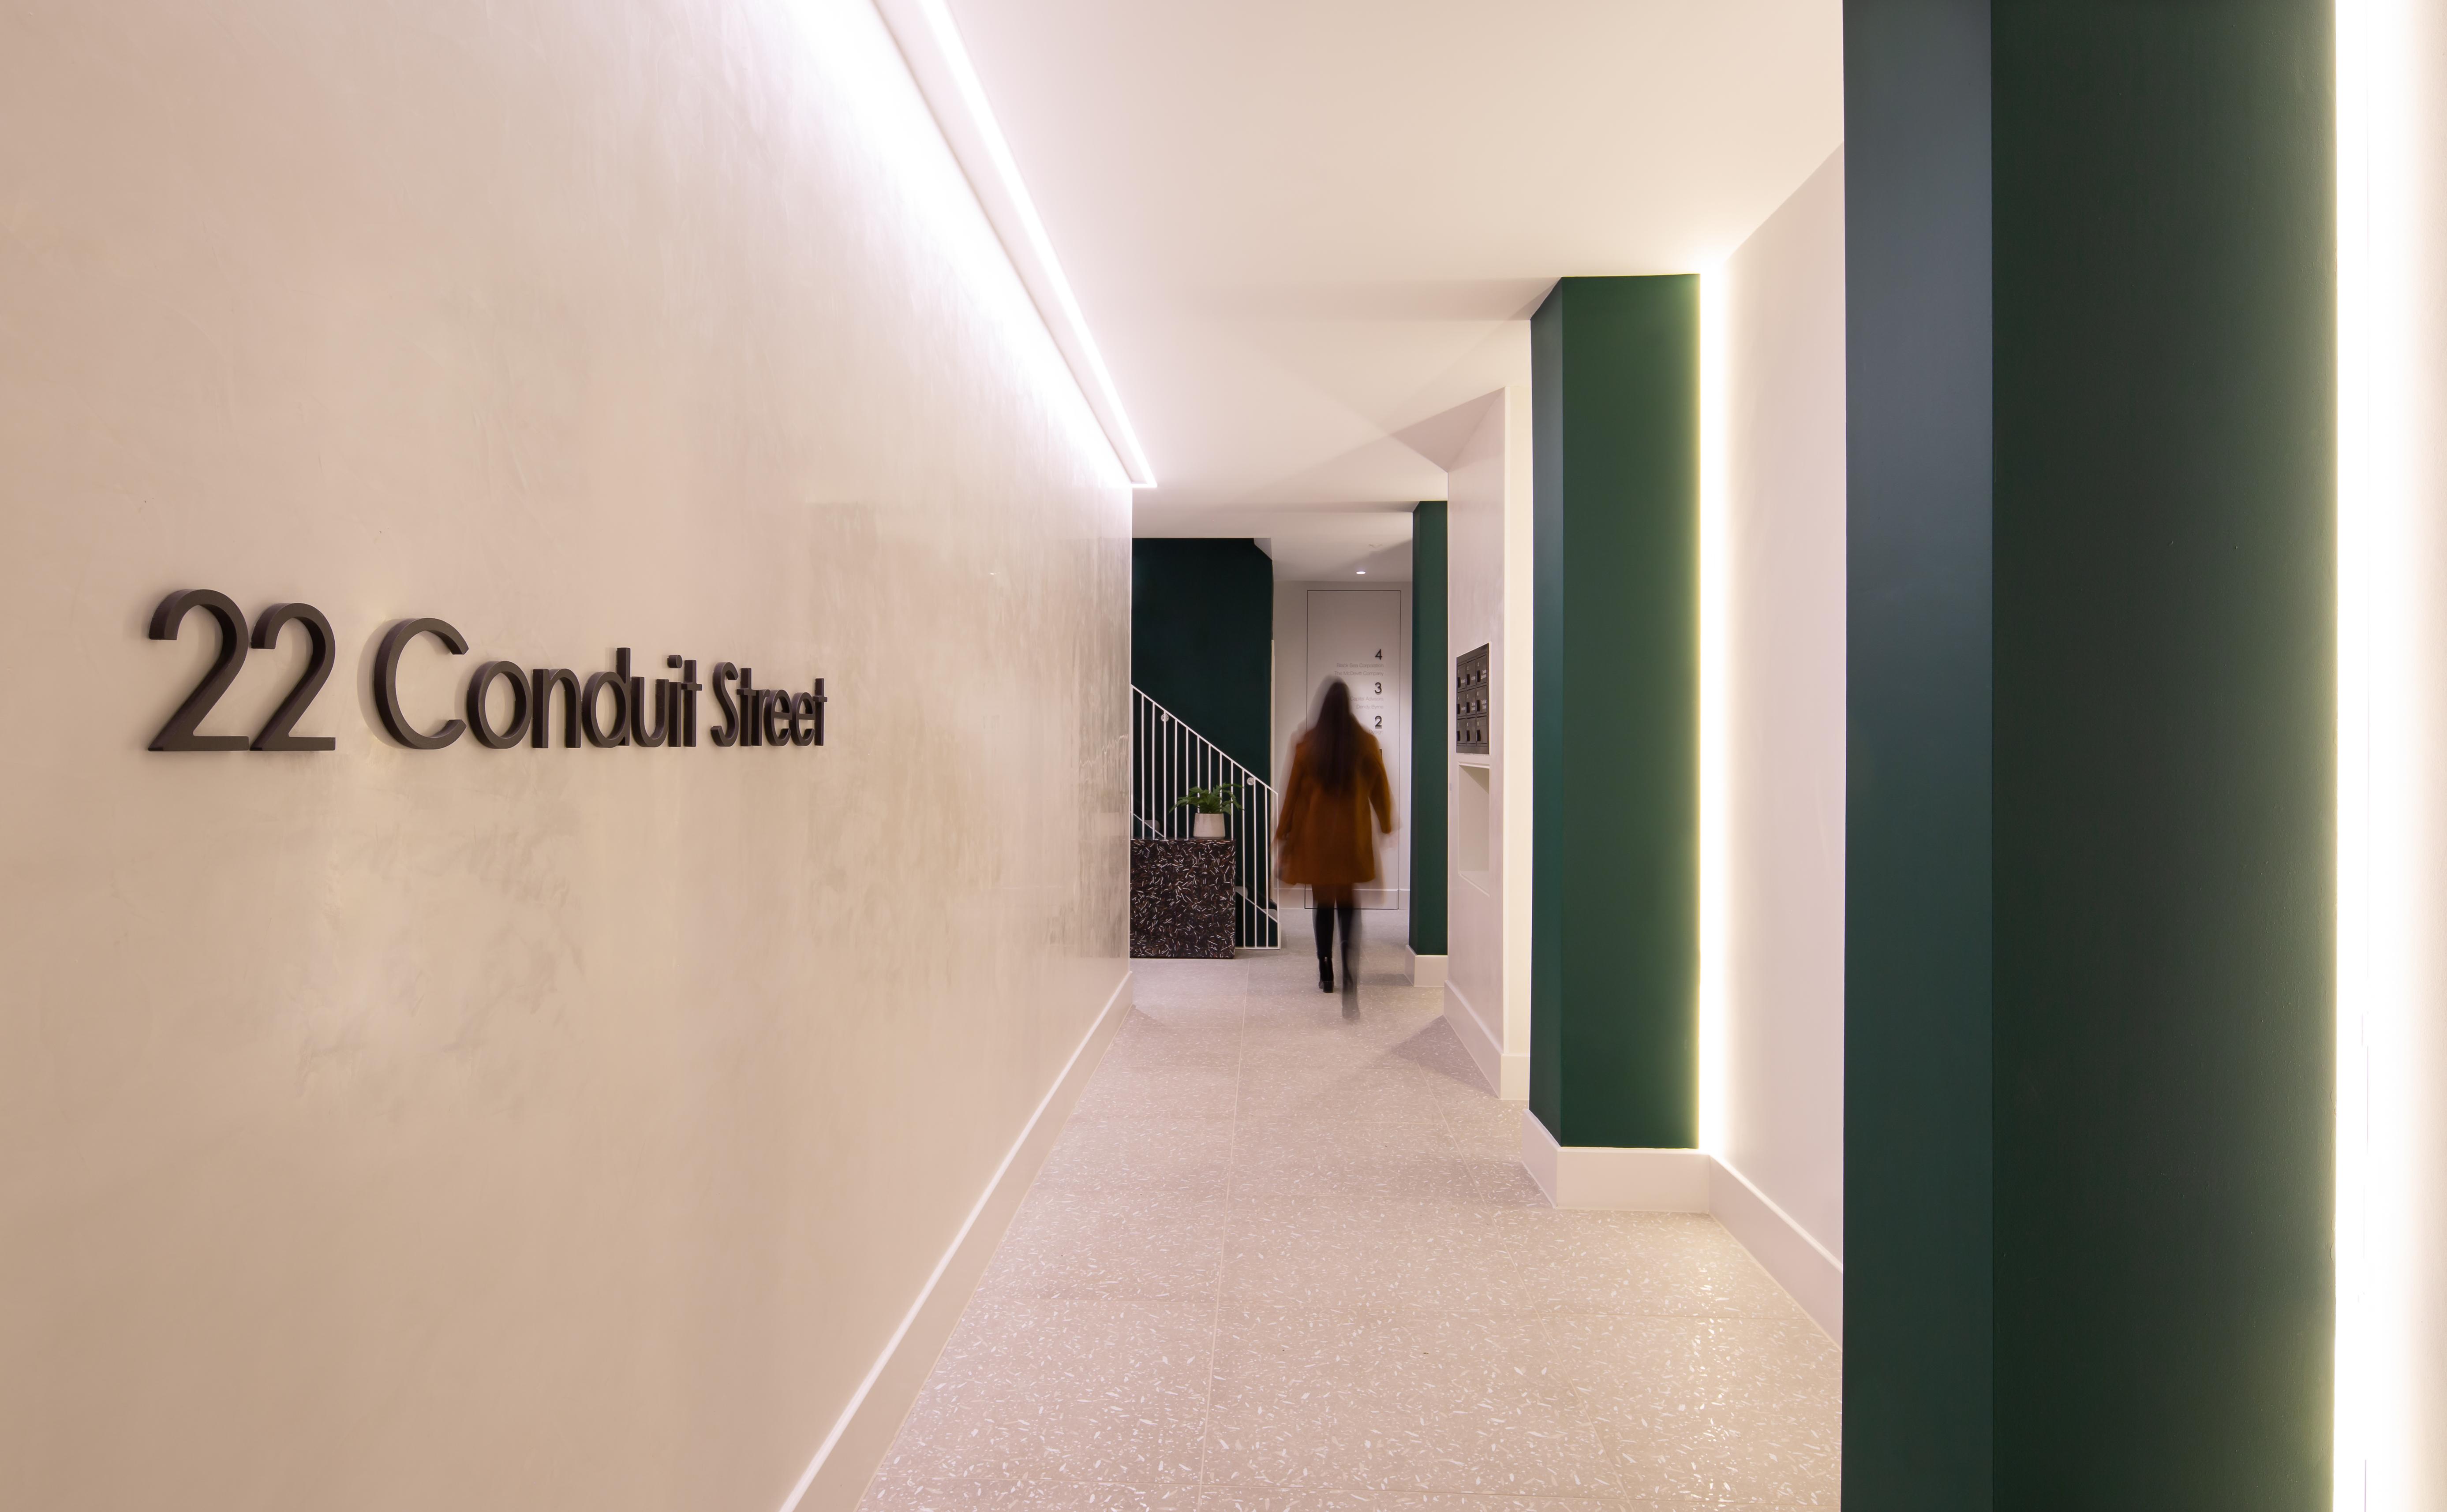 22 Conduit Street London